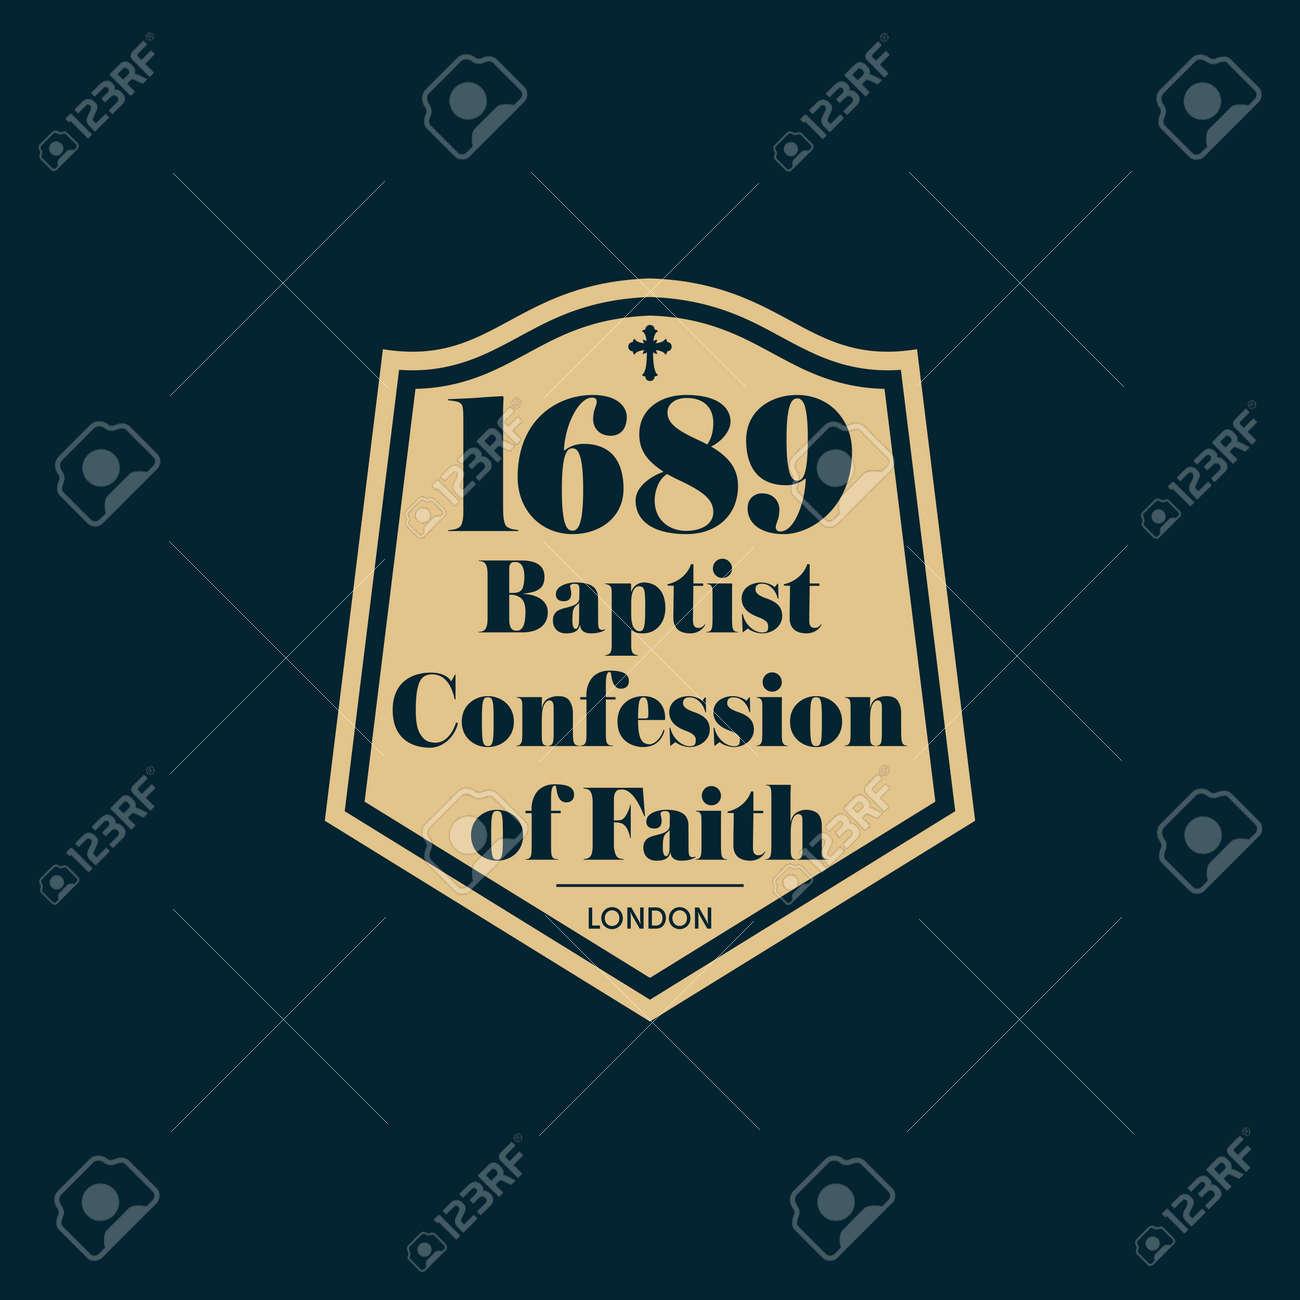 Reformed christian art. The 1689 Baptist Confession of Faith. - 166913168